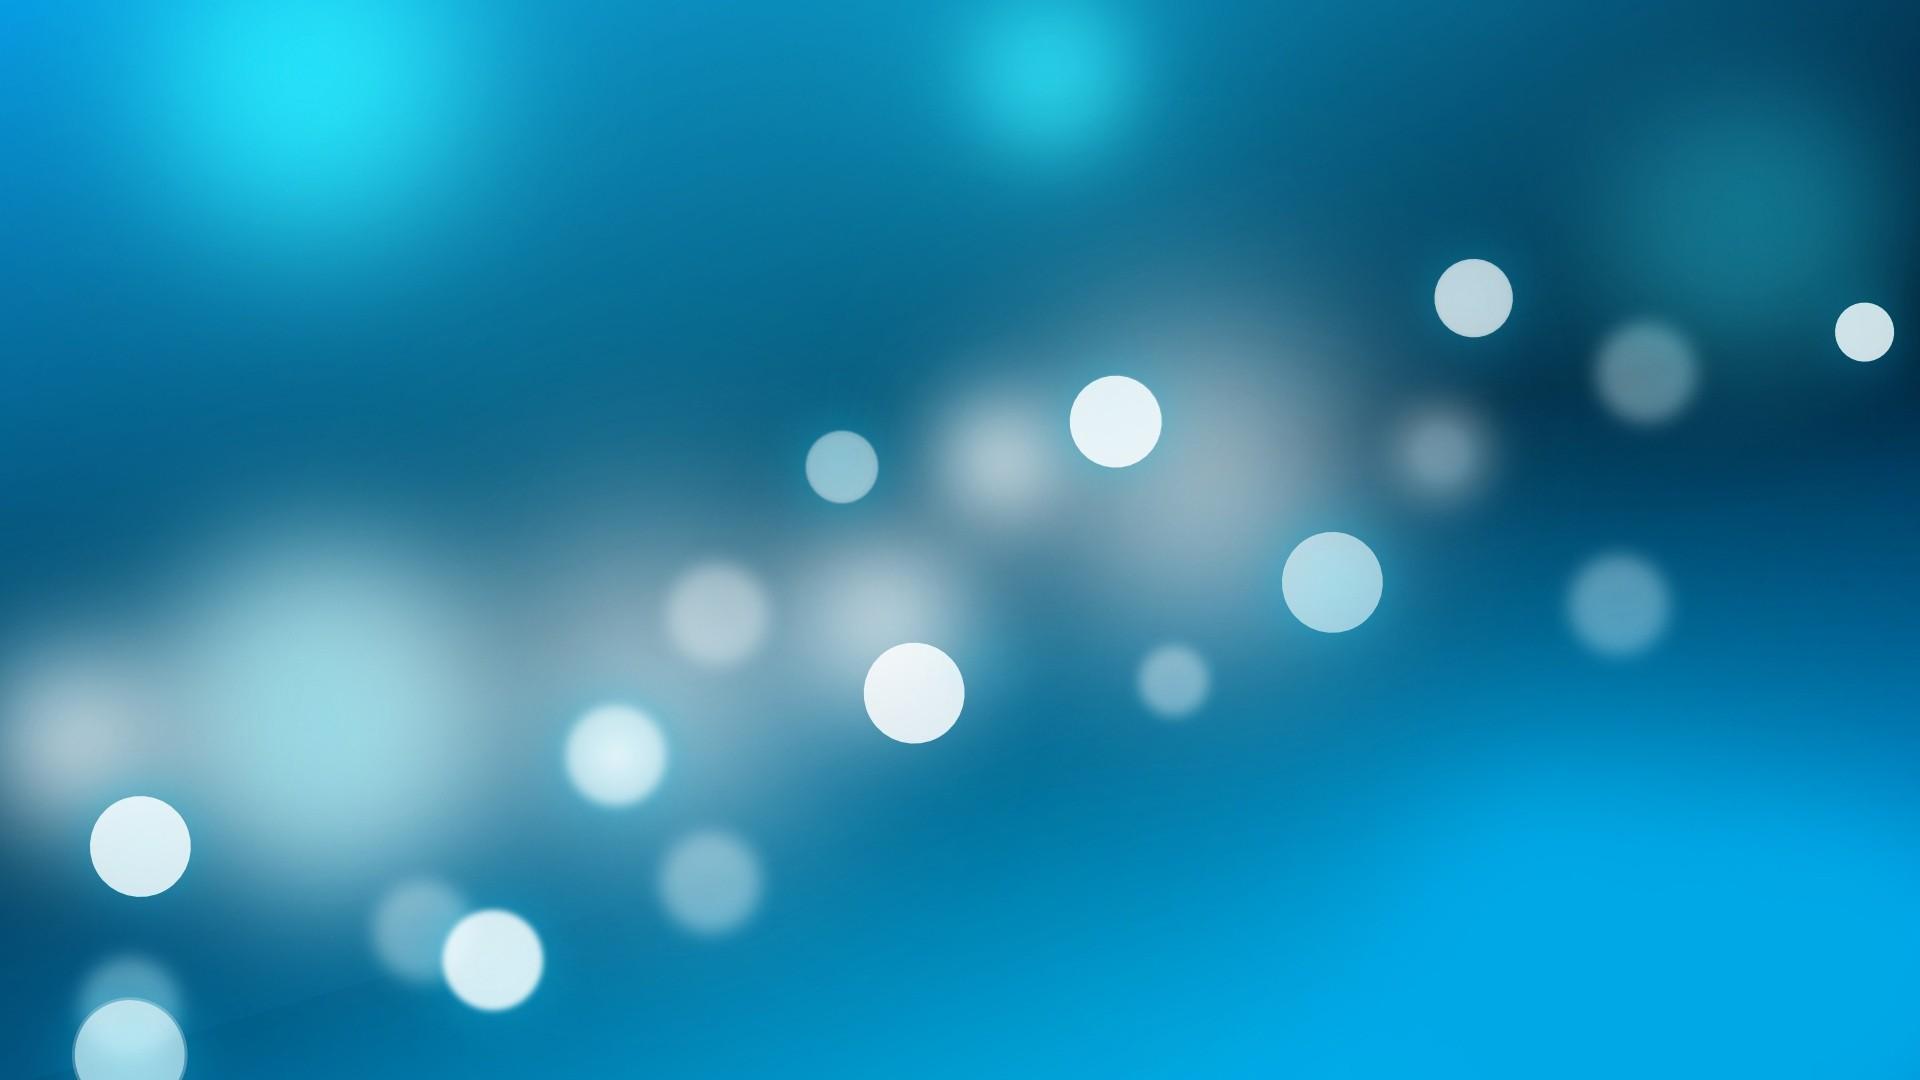 Spark Blue Picture